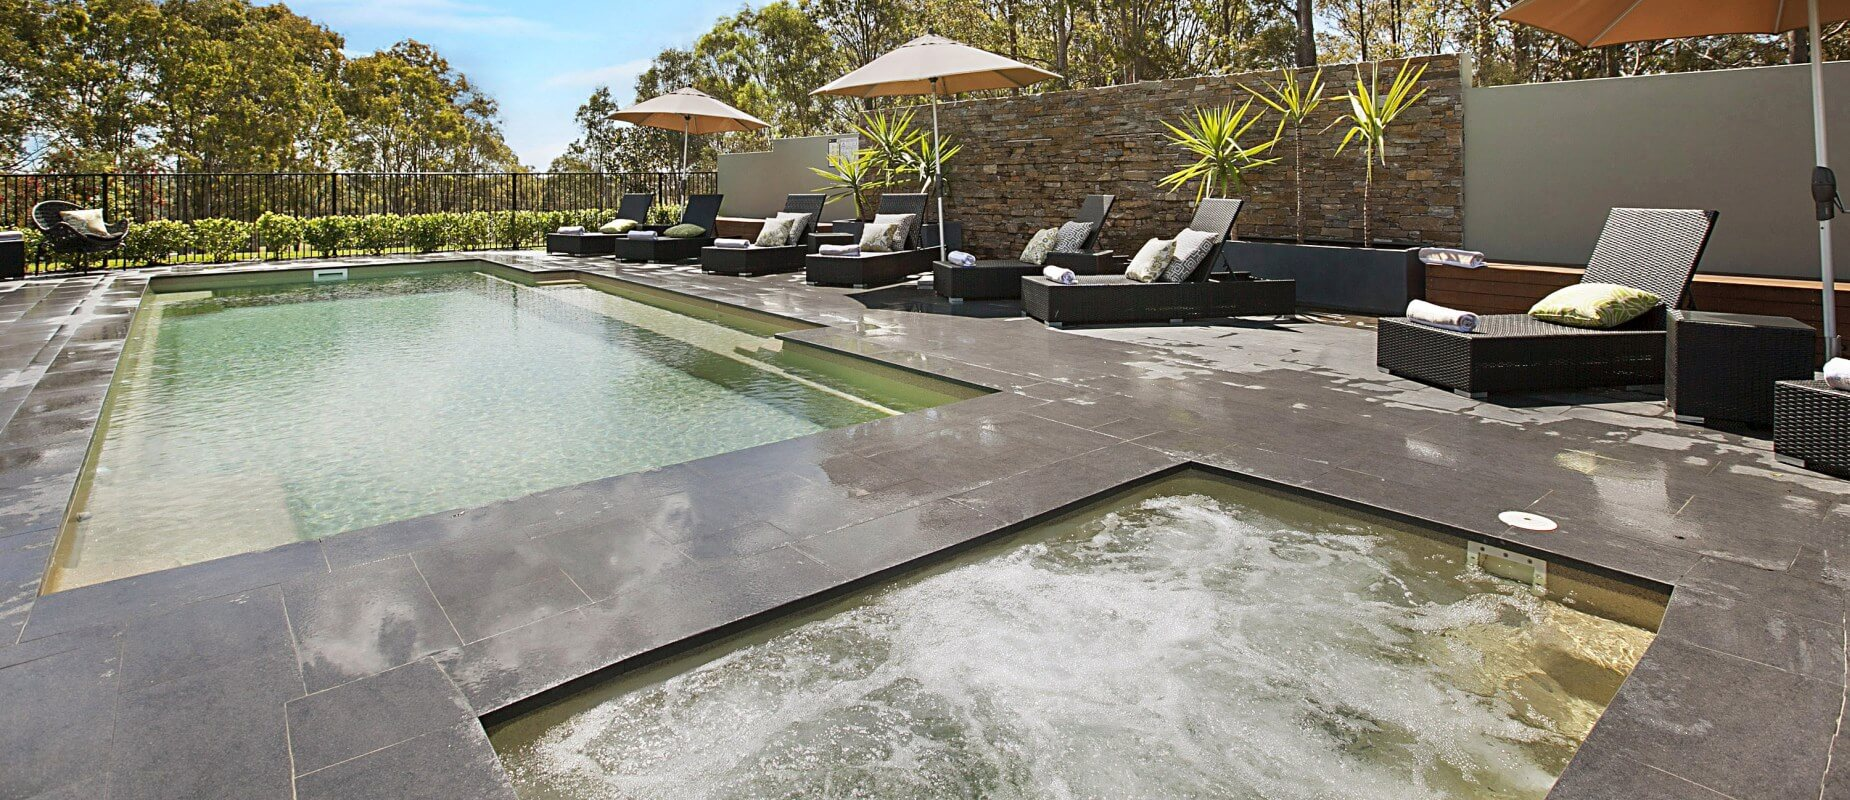 piscina de lux modele frumoase 8